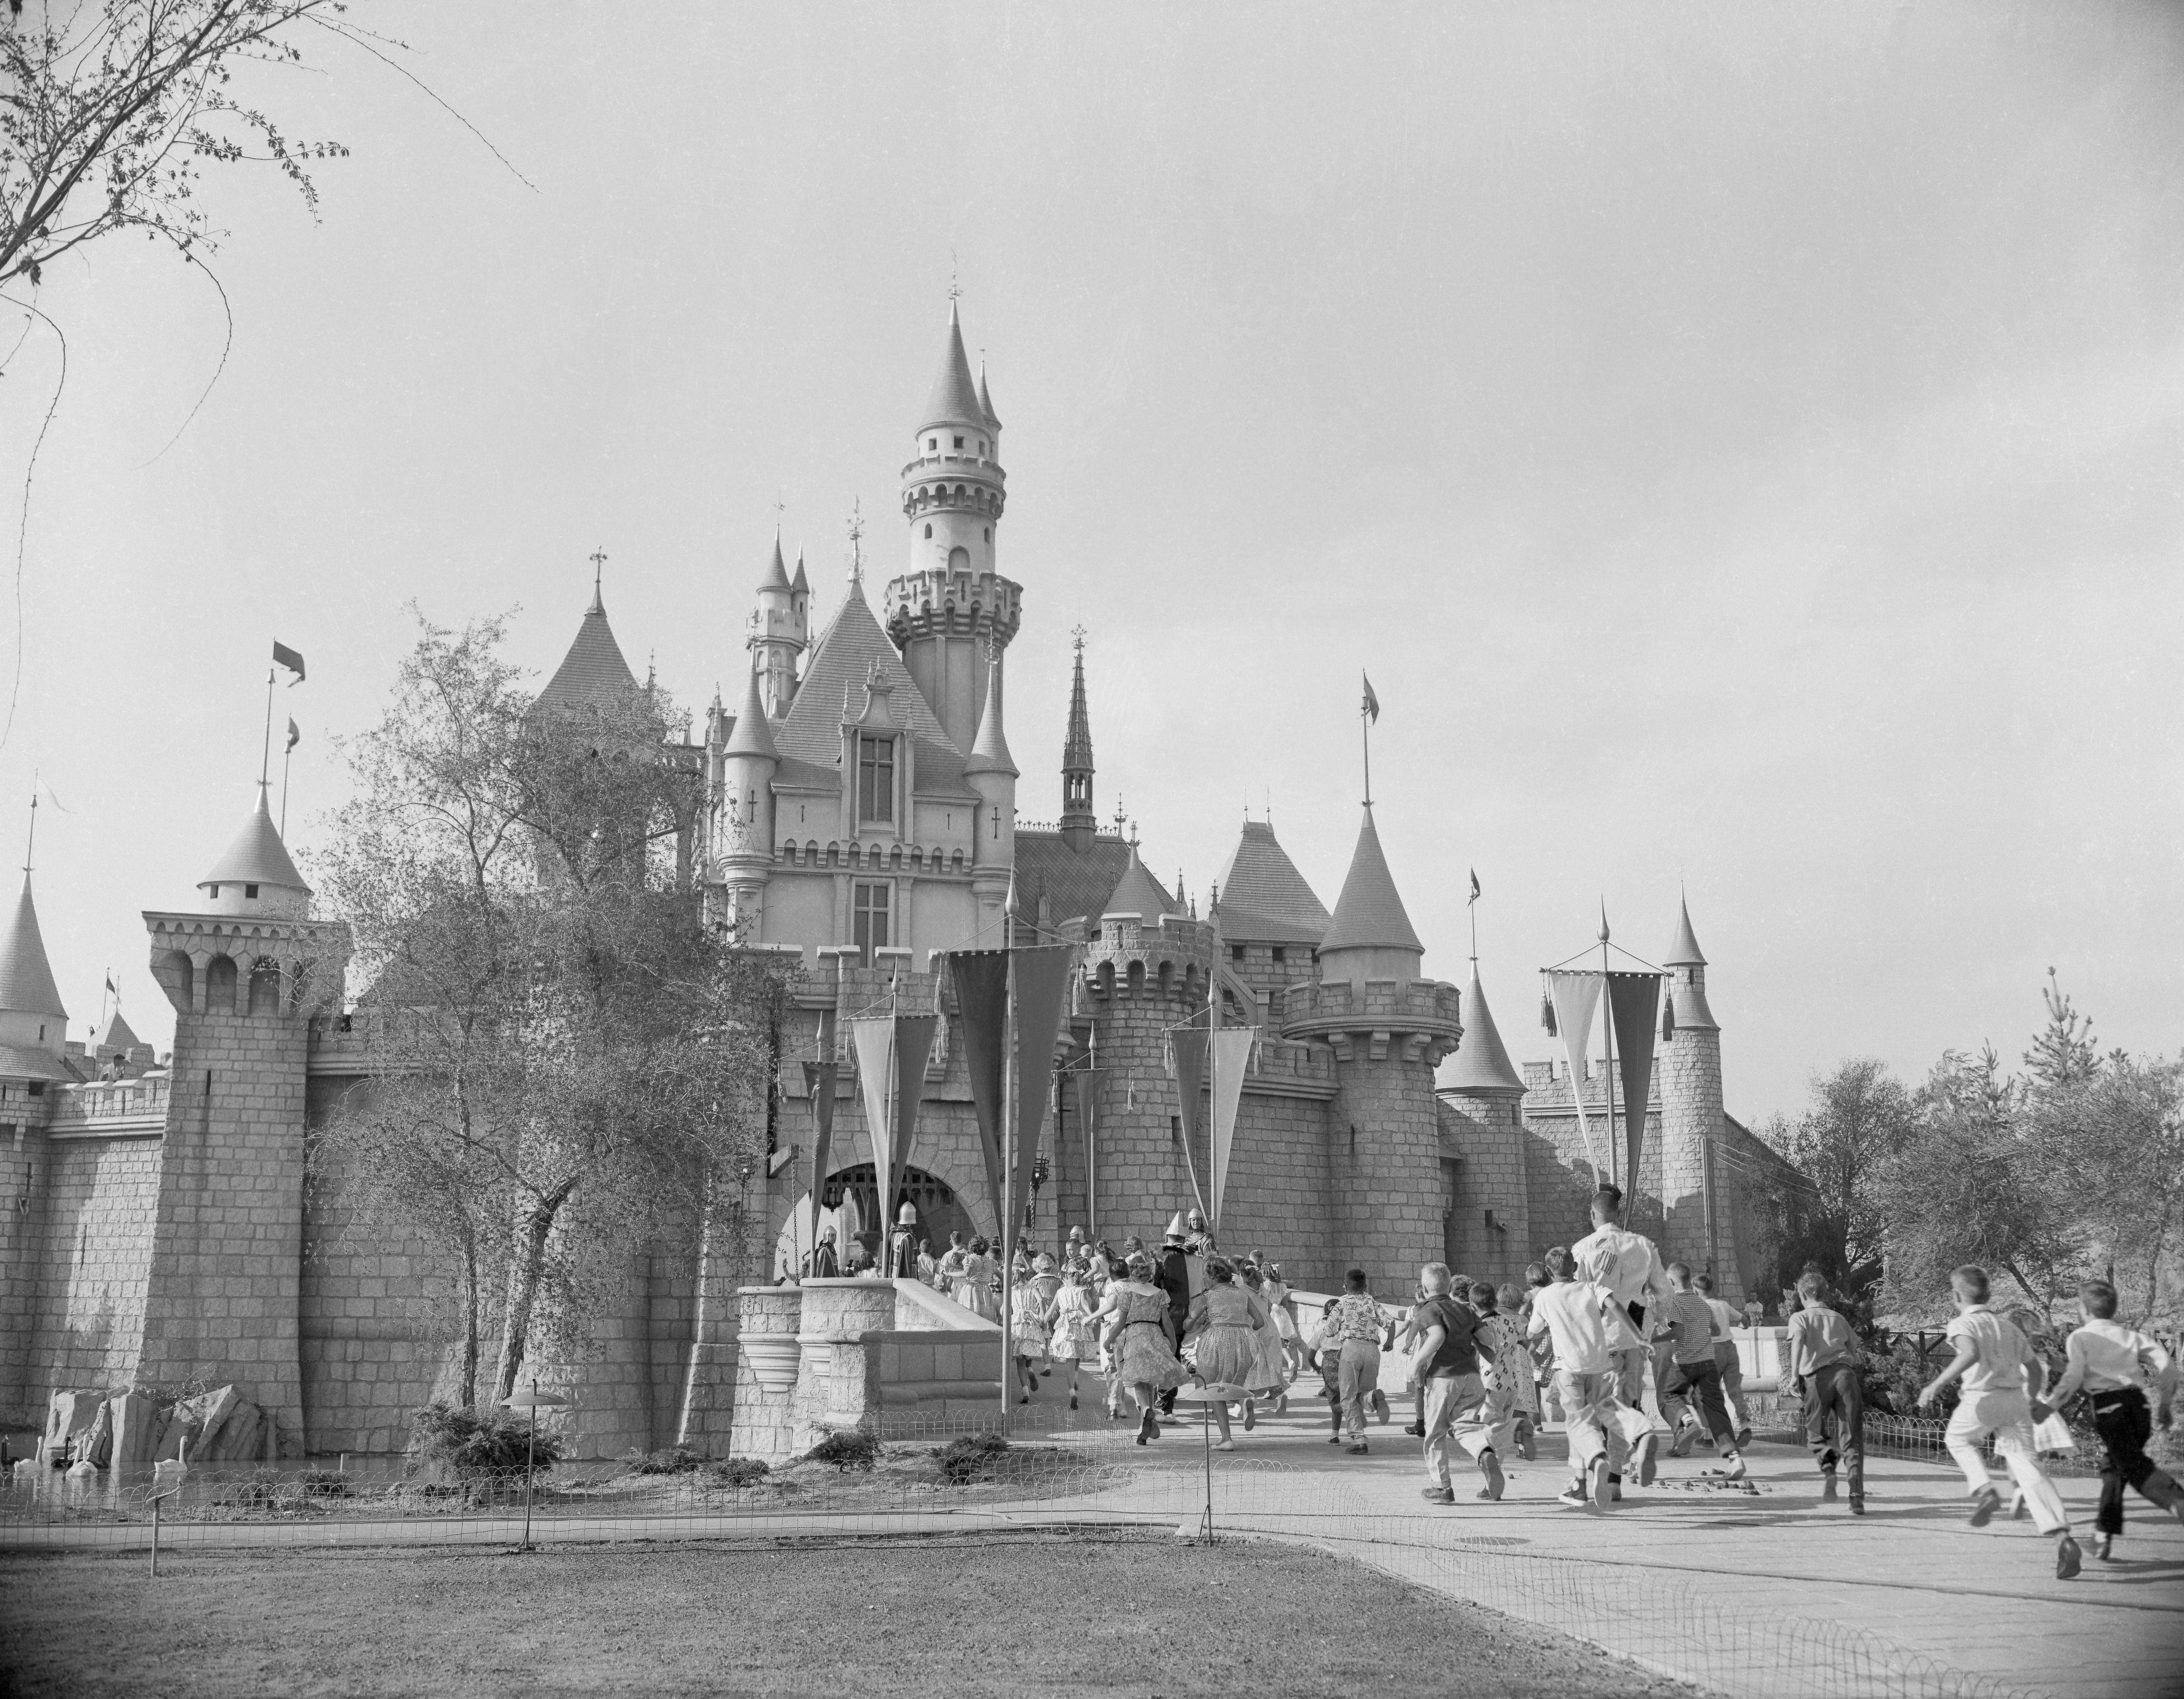 Rushing Toward Sleeping Beauty Castle on Disneyland's Opening Day